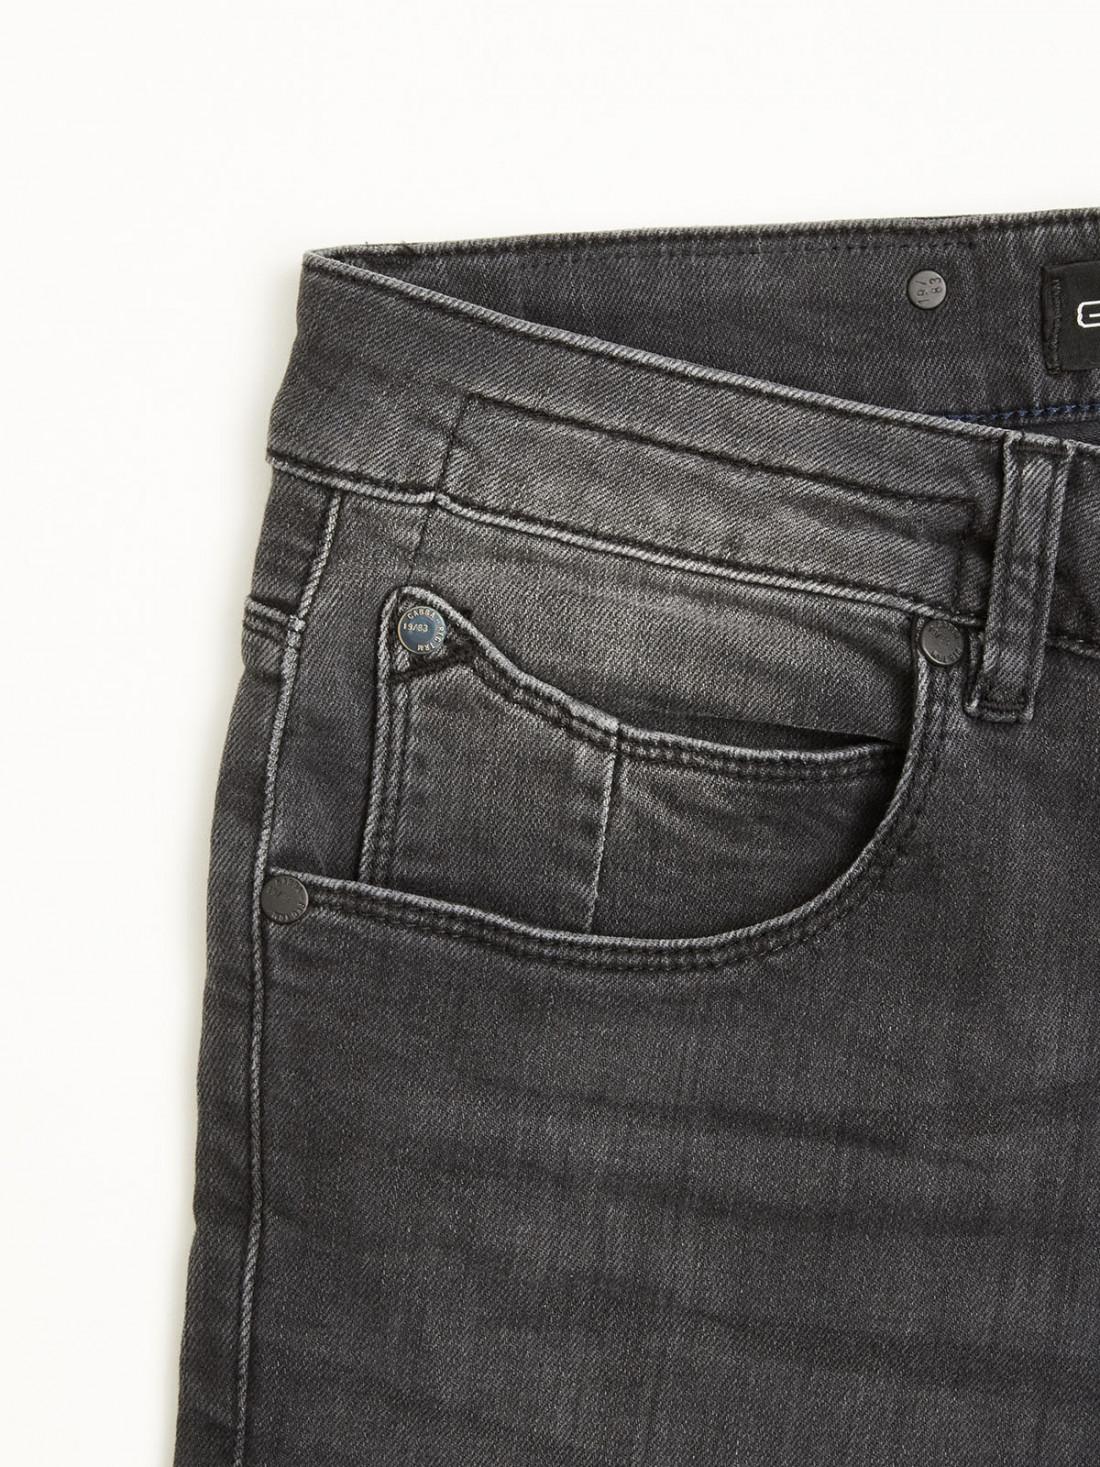 Pantalón gris, efecto lavado, corte recto con cinco bolsillos.